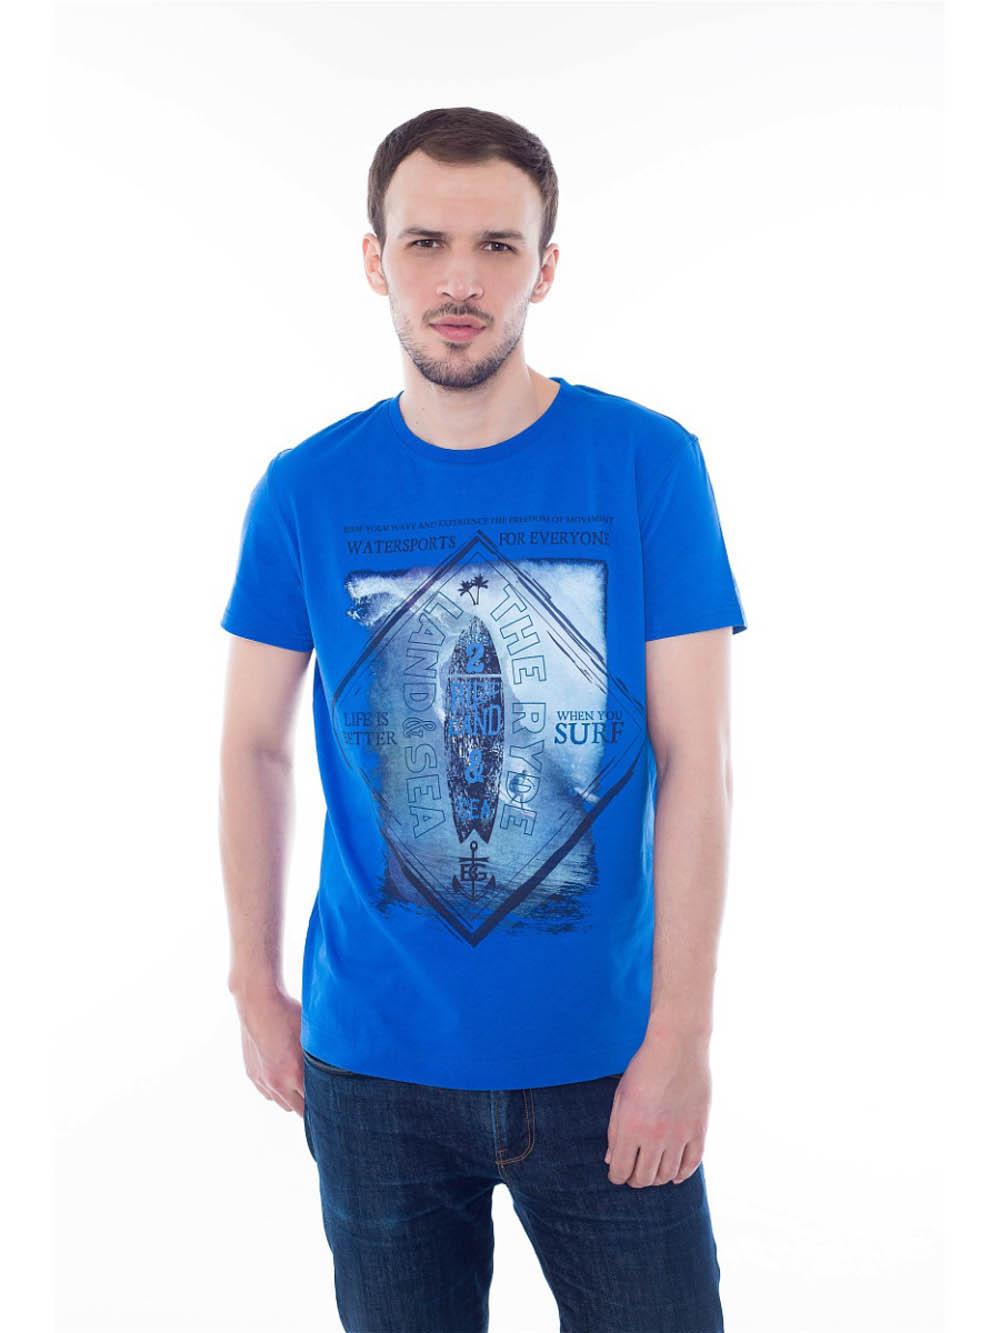 Футболки BeGood Футболка Water Sports Цвет: Синий (L-xL) футболки begood футболка three цвет фуксия xl